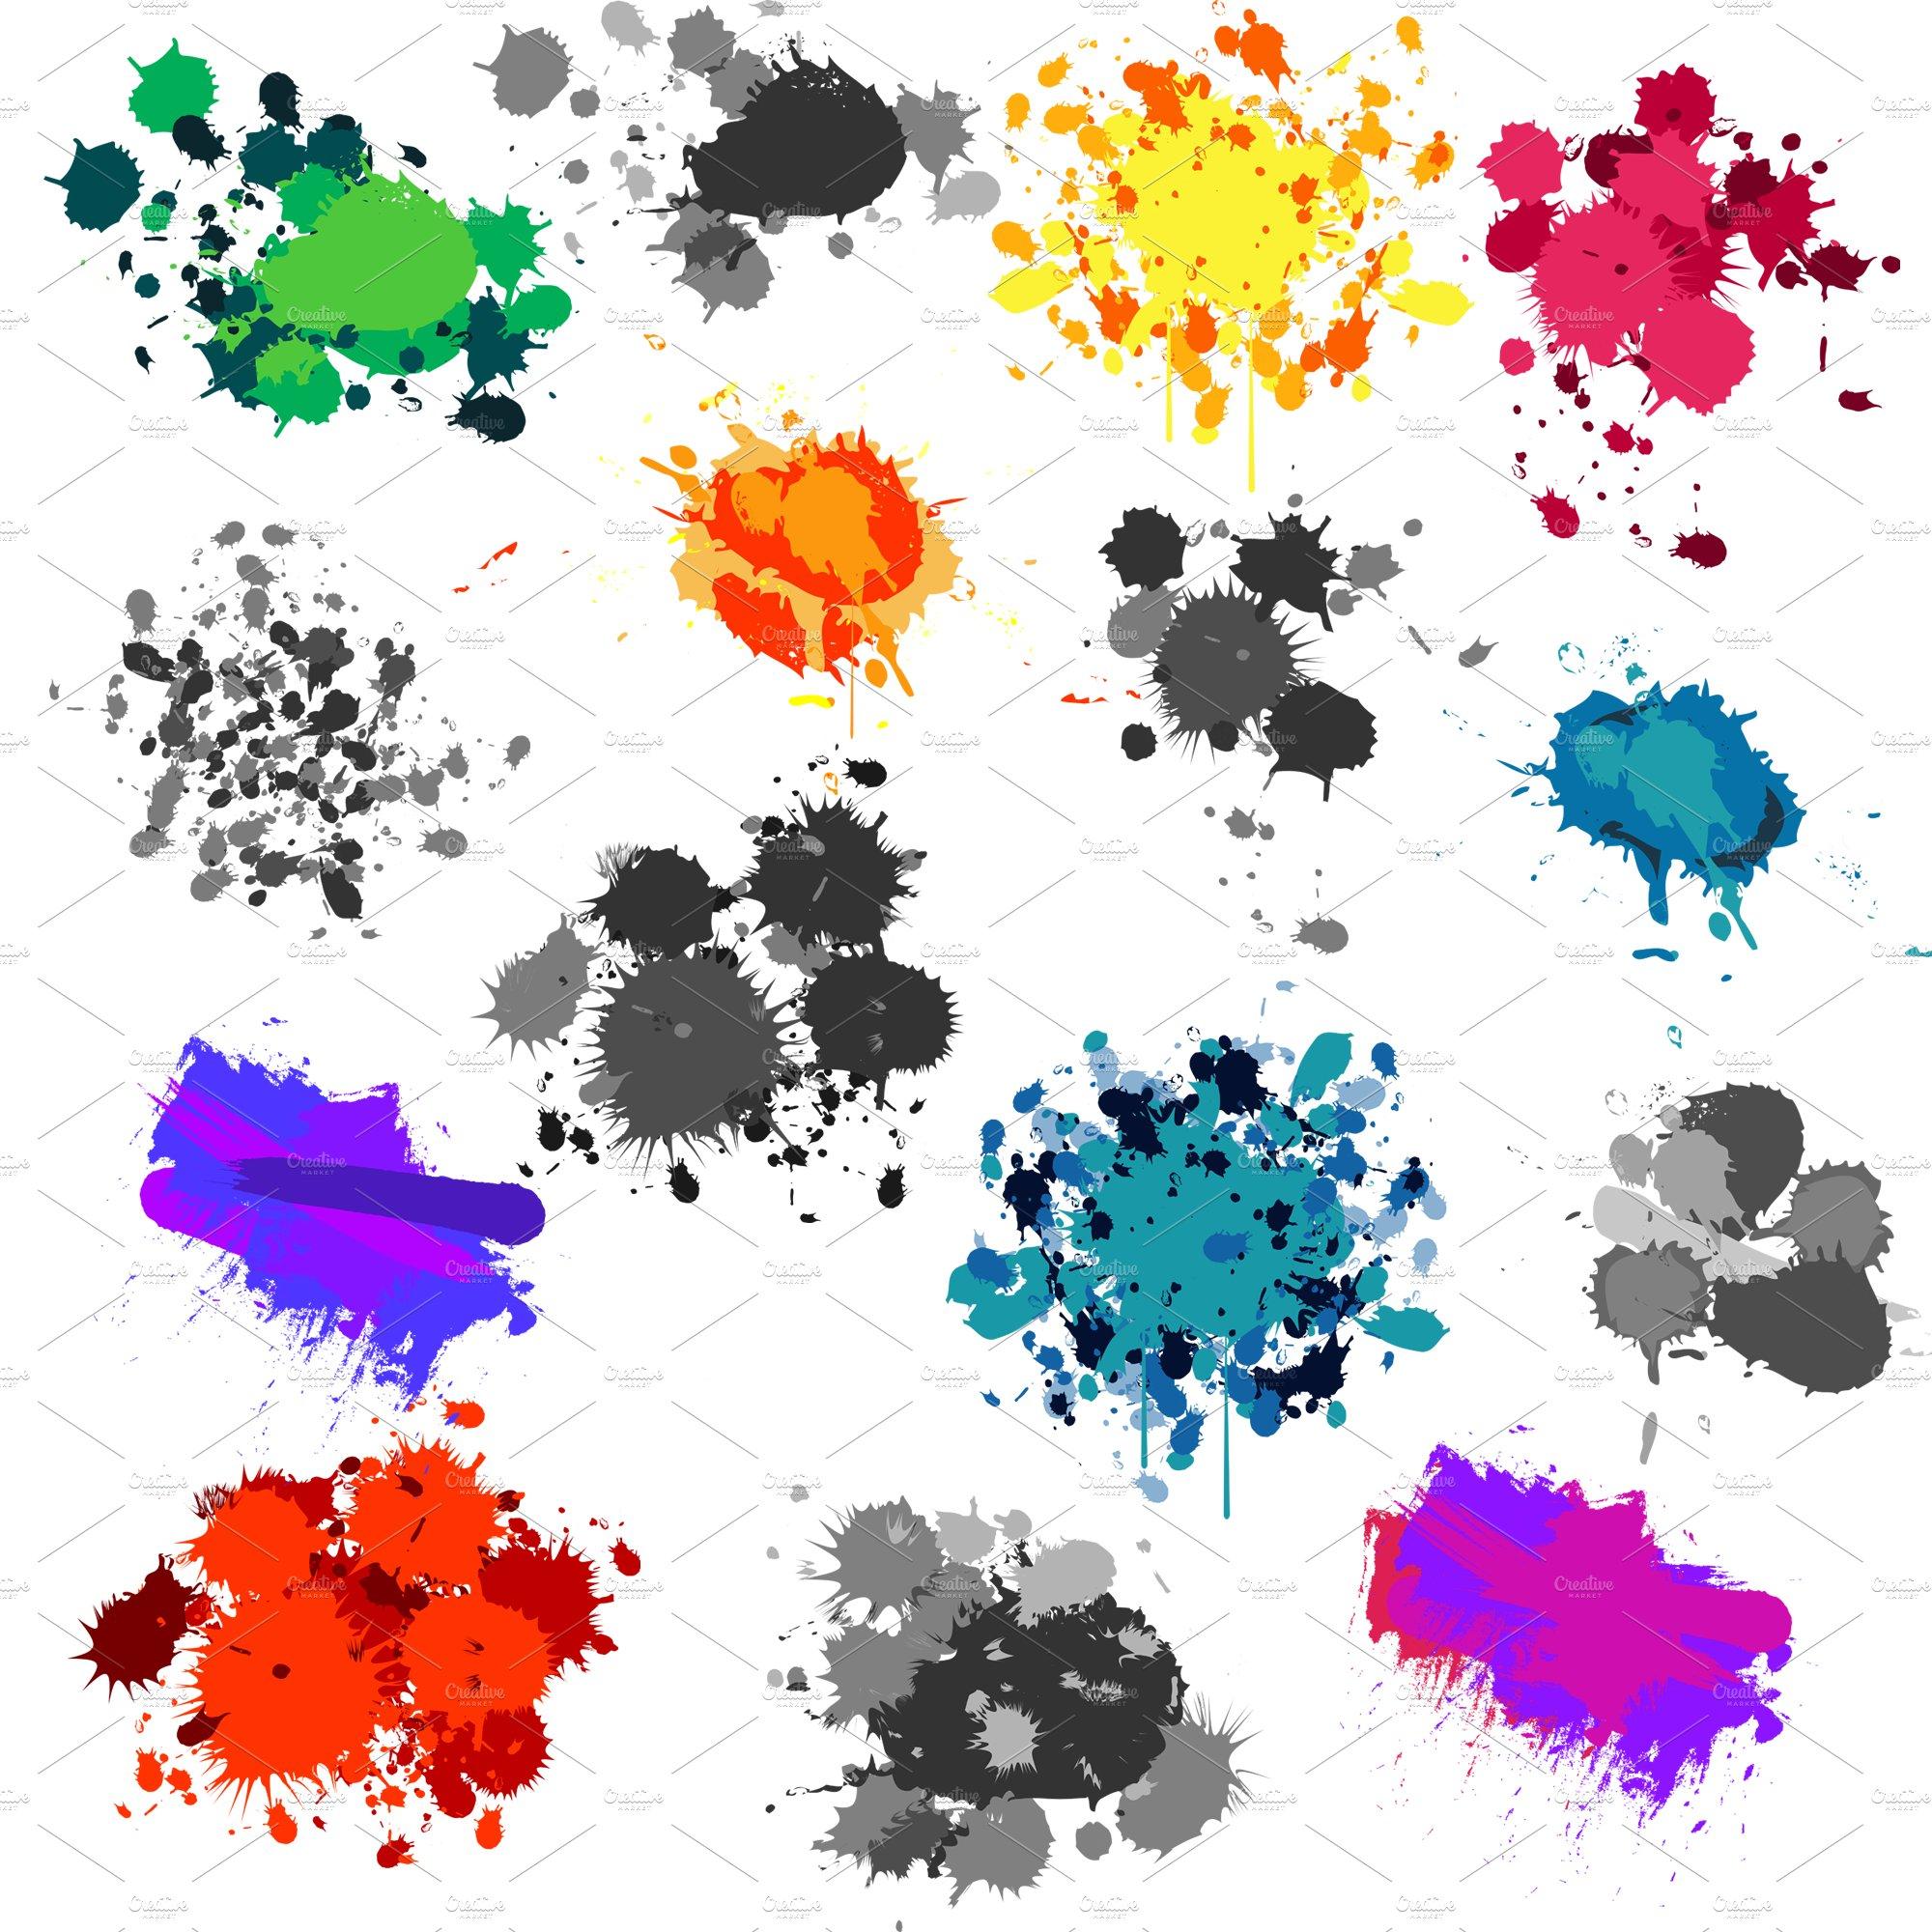 Paint Splatters Vectors And Clipart Illustrations Creative Market